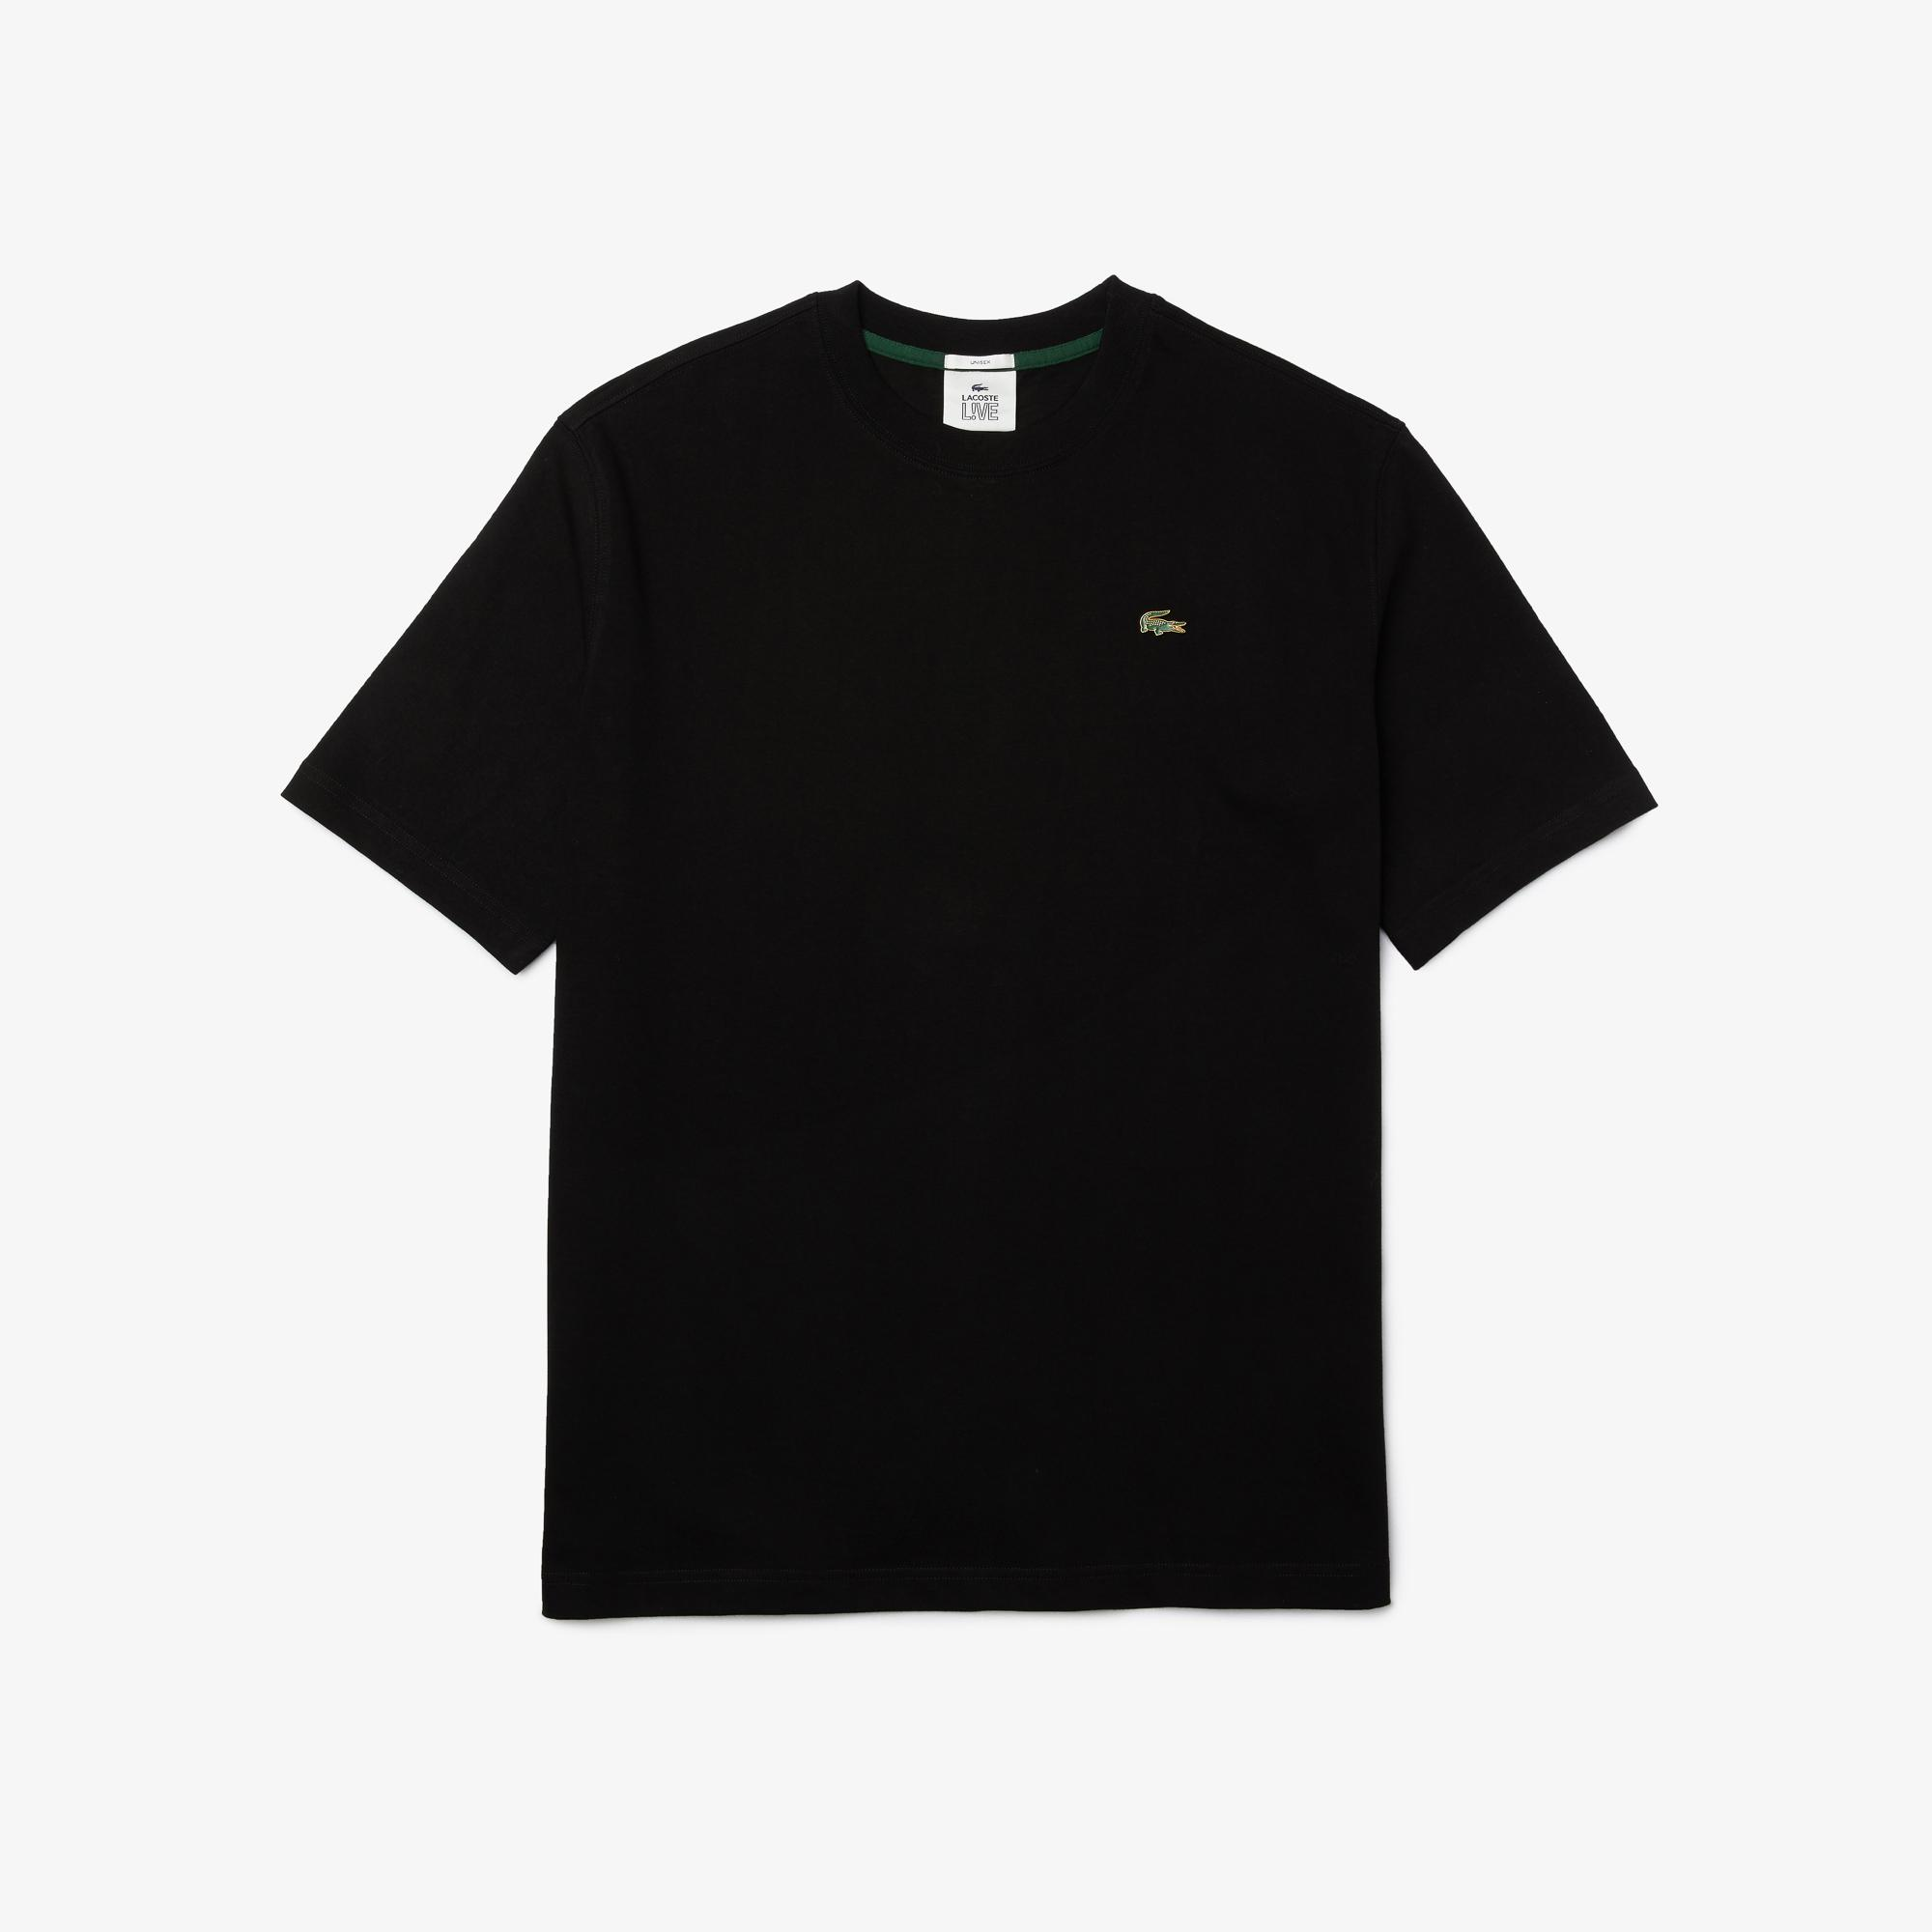 Lacoste L!ve Unisex Loose Fit Bisiklet Yaka Siyah T-Shirt